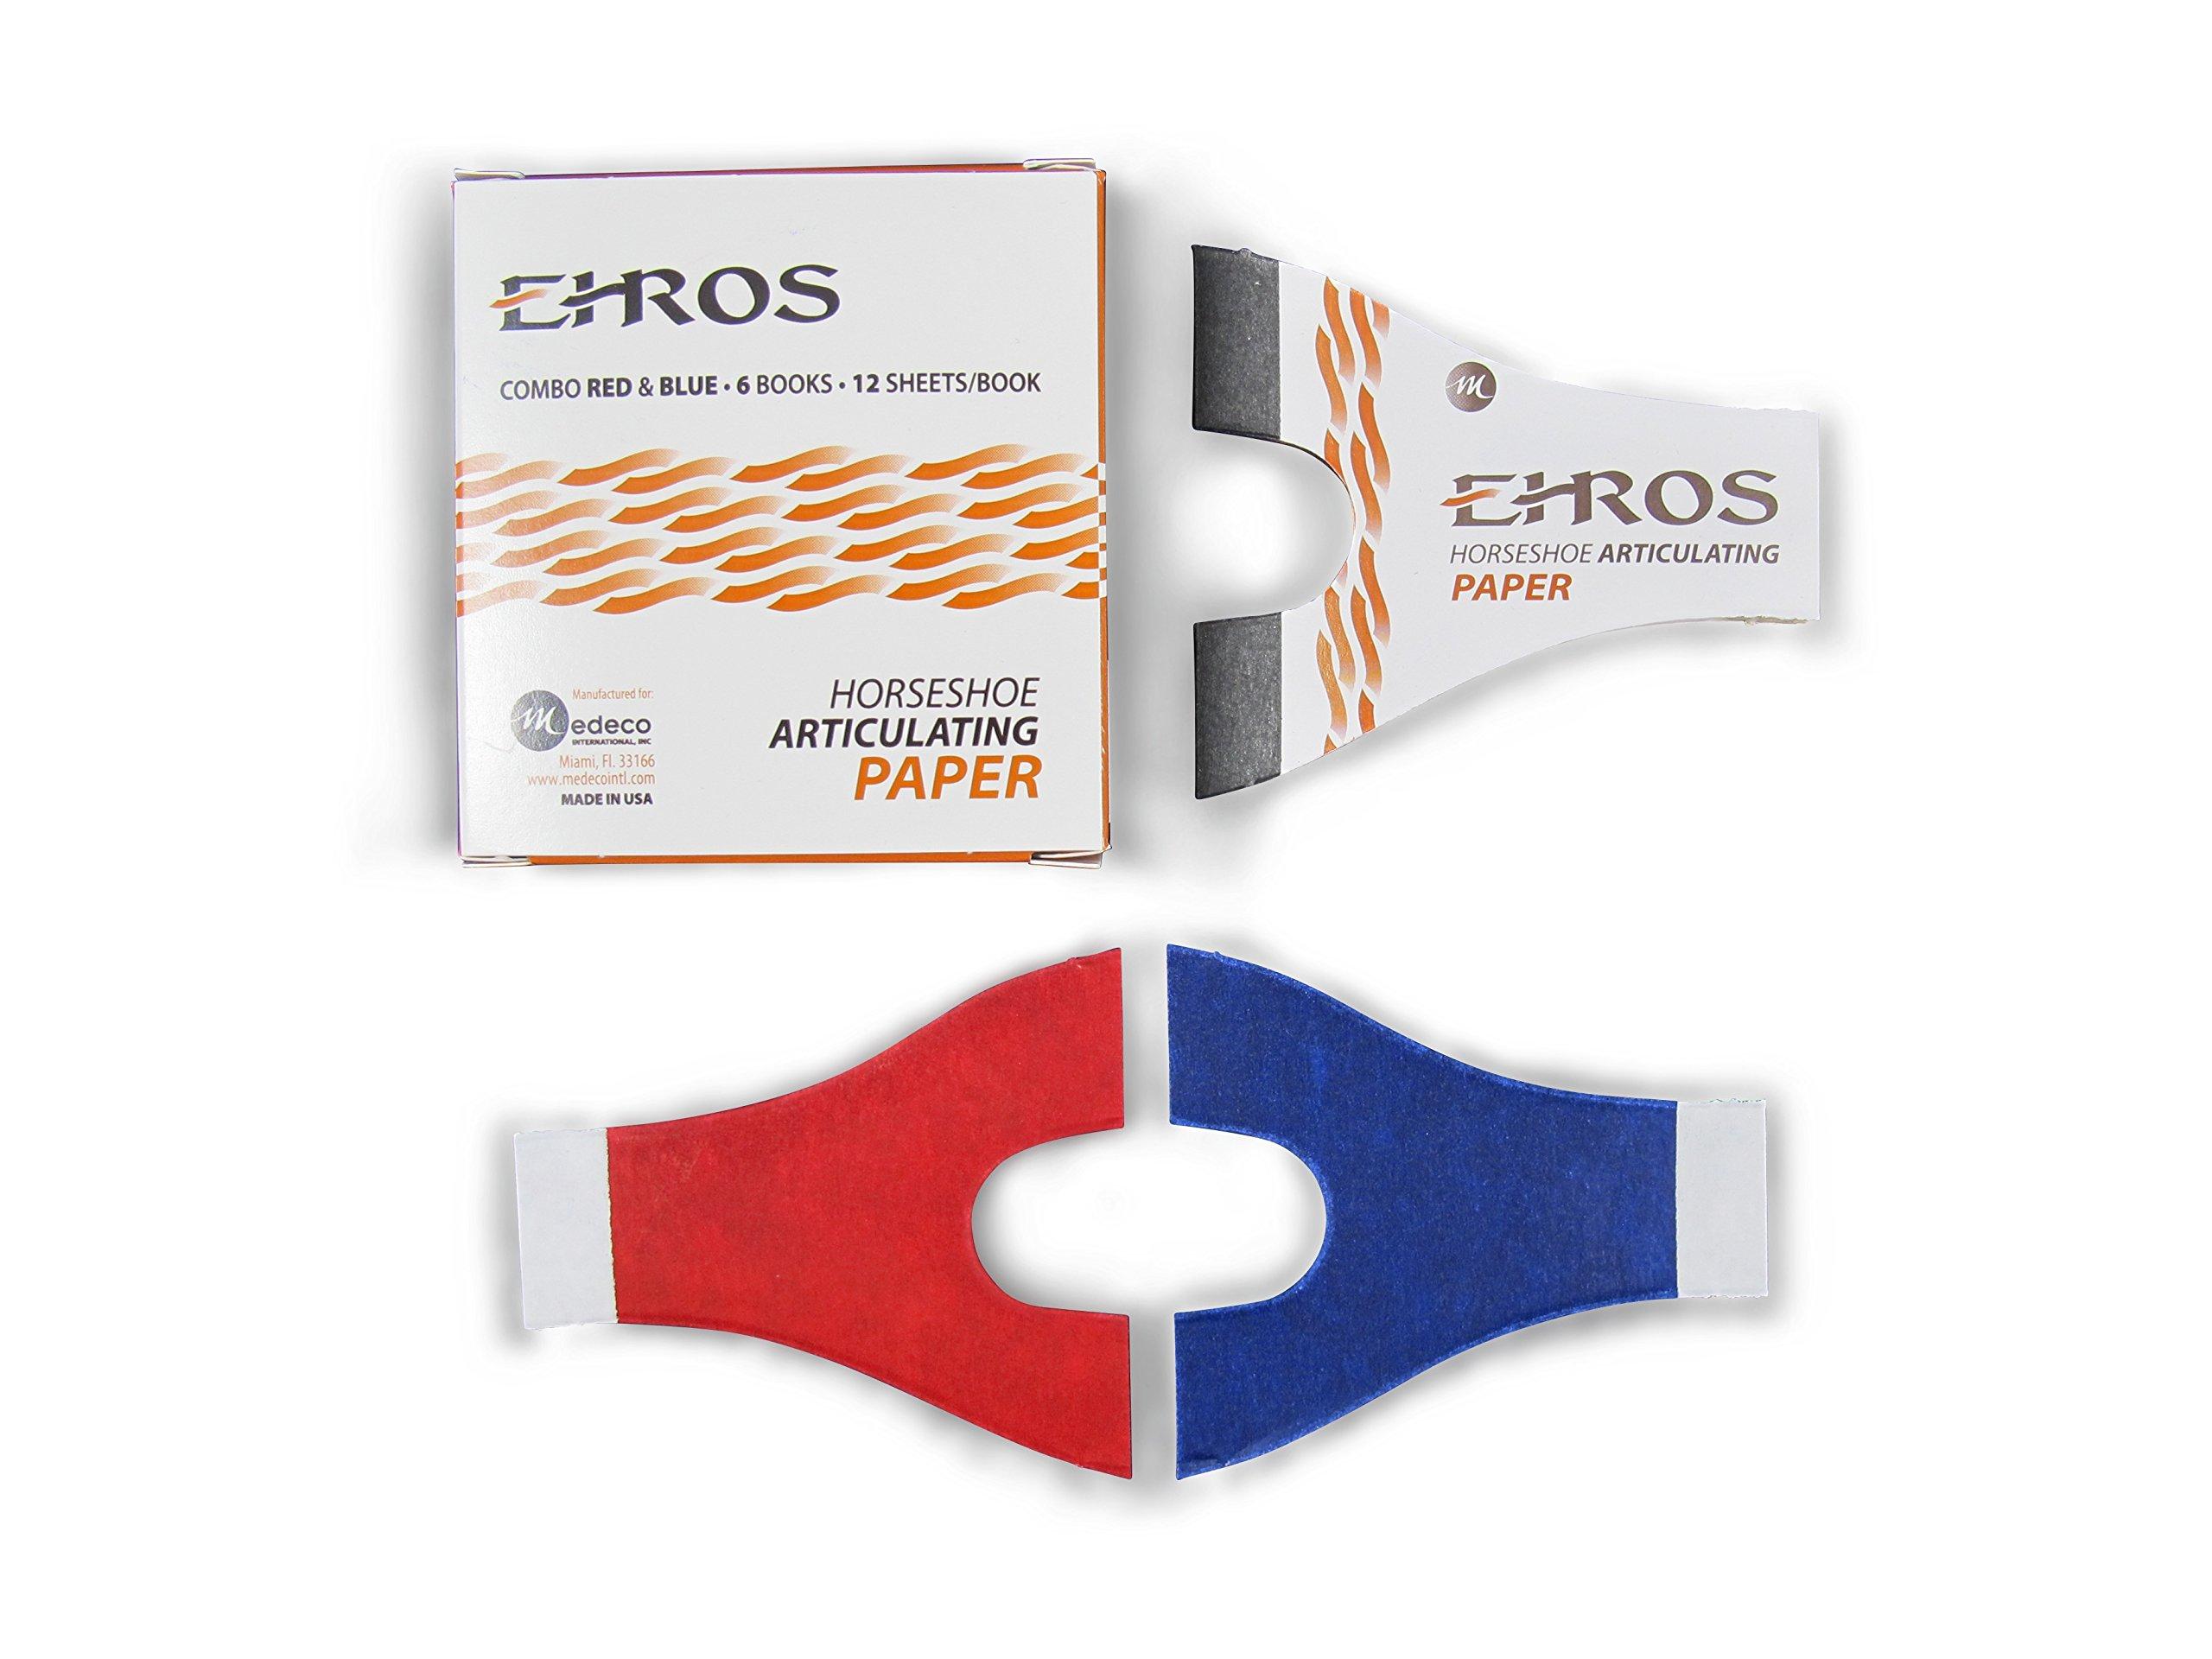 Ehros Horseshoe Articulating Paper, Red/Blue, 6 Books per Box, 12 Sheets per Book (Pack of 72)